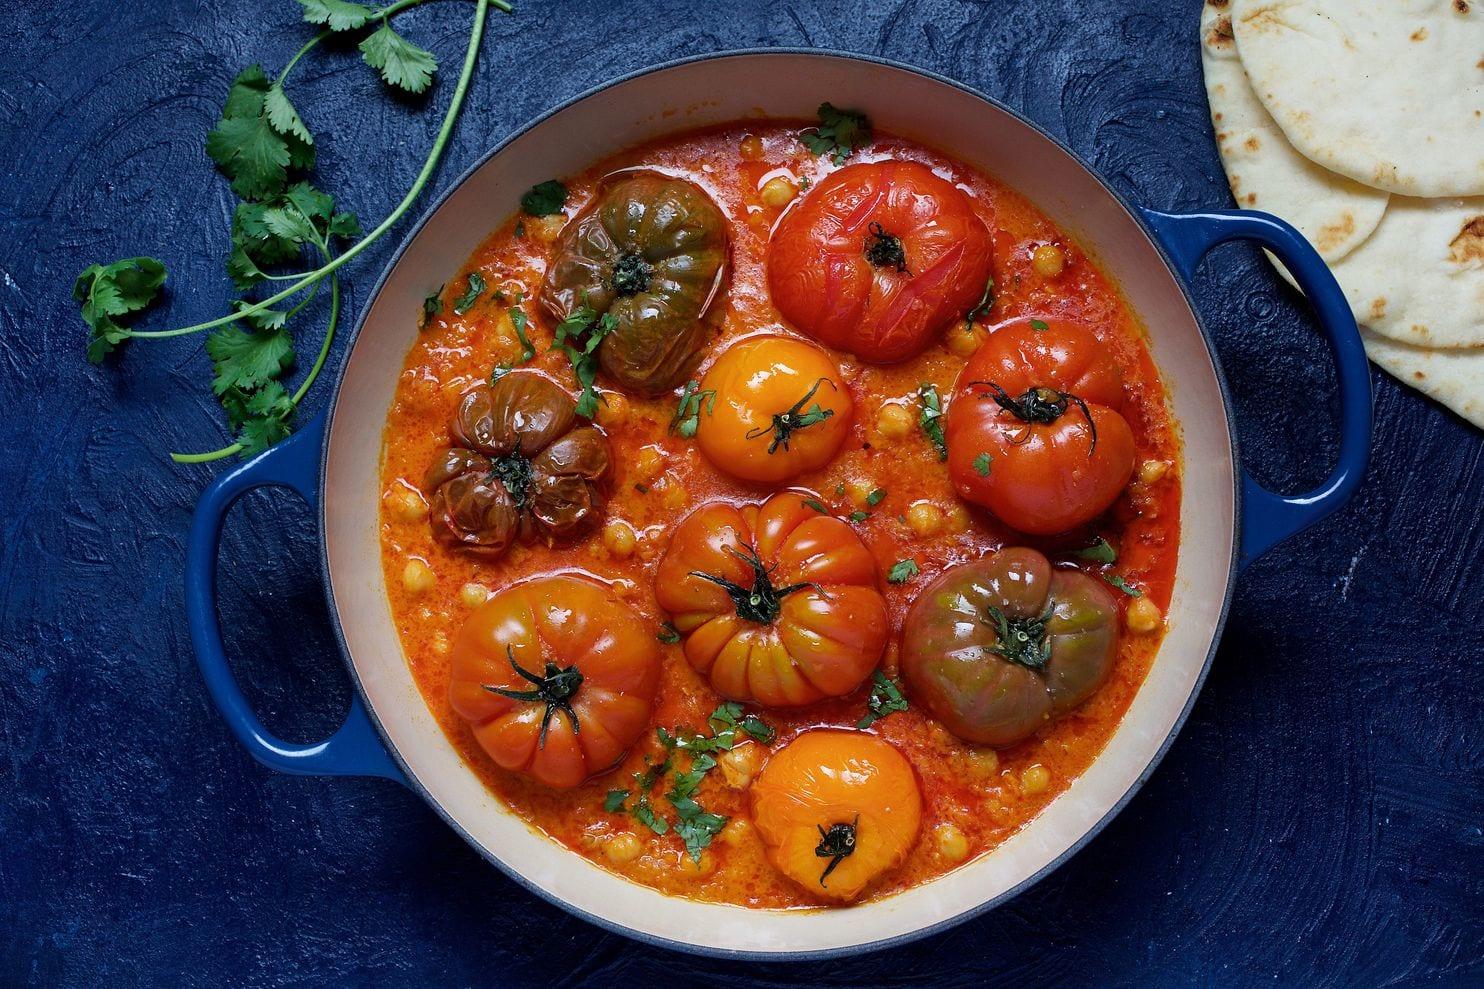 Vegan Summer Recipes I Roasted Tomato Chickpea Curry #Vegan #Curry #SummerRecipe